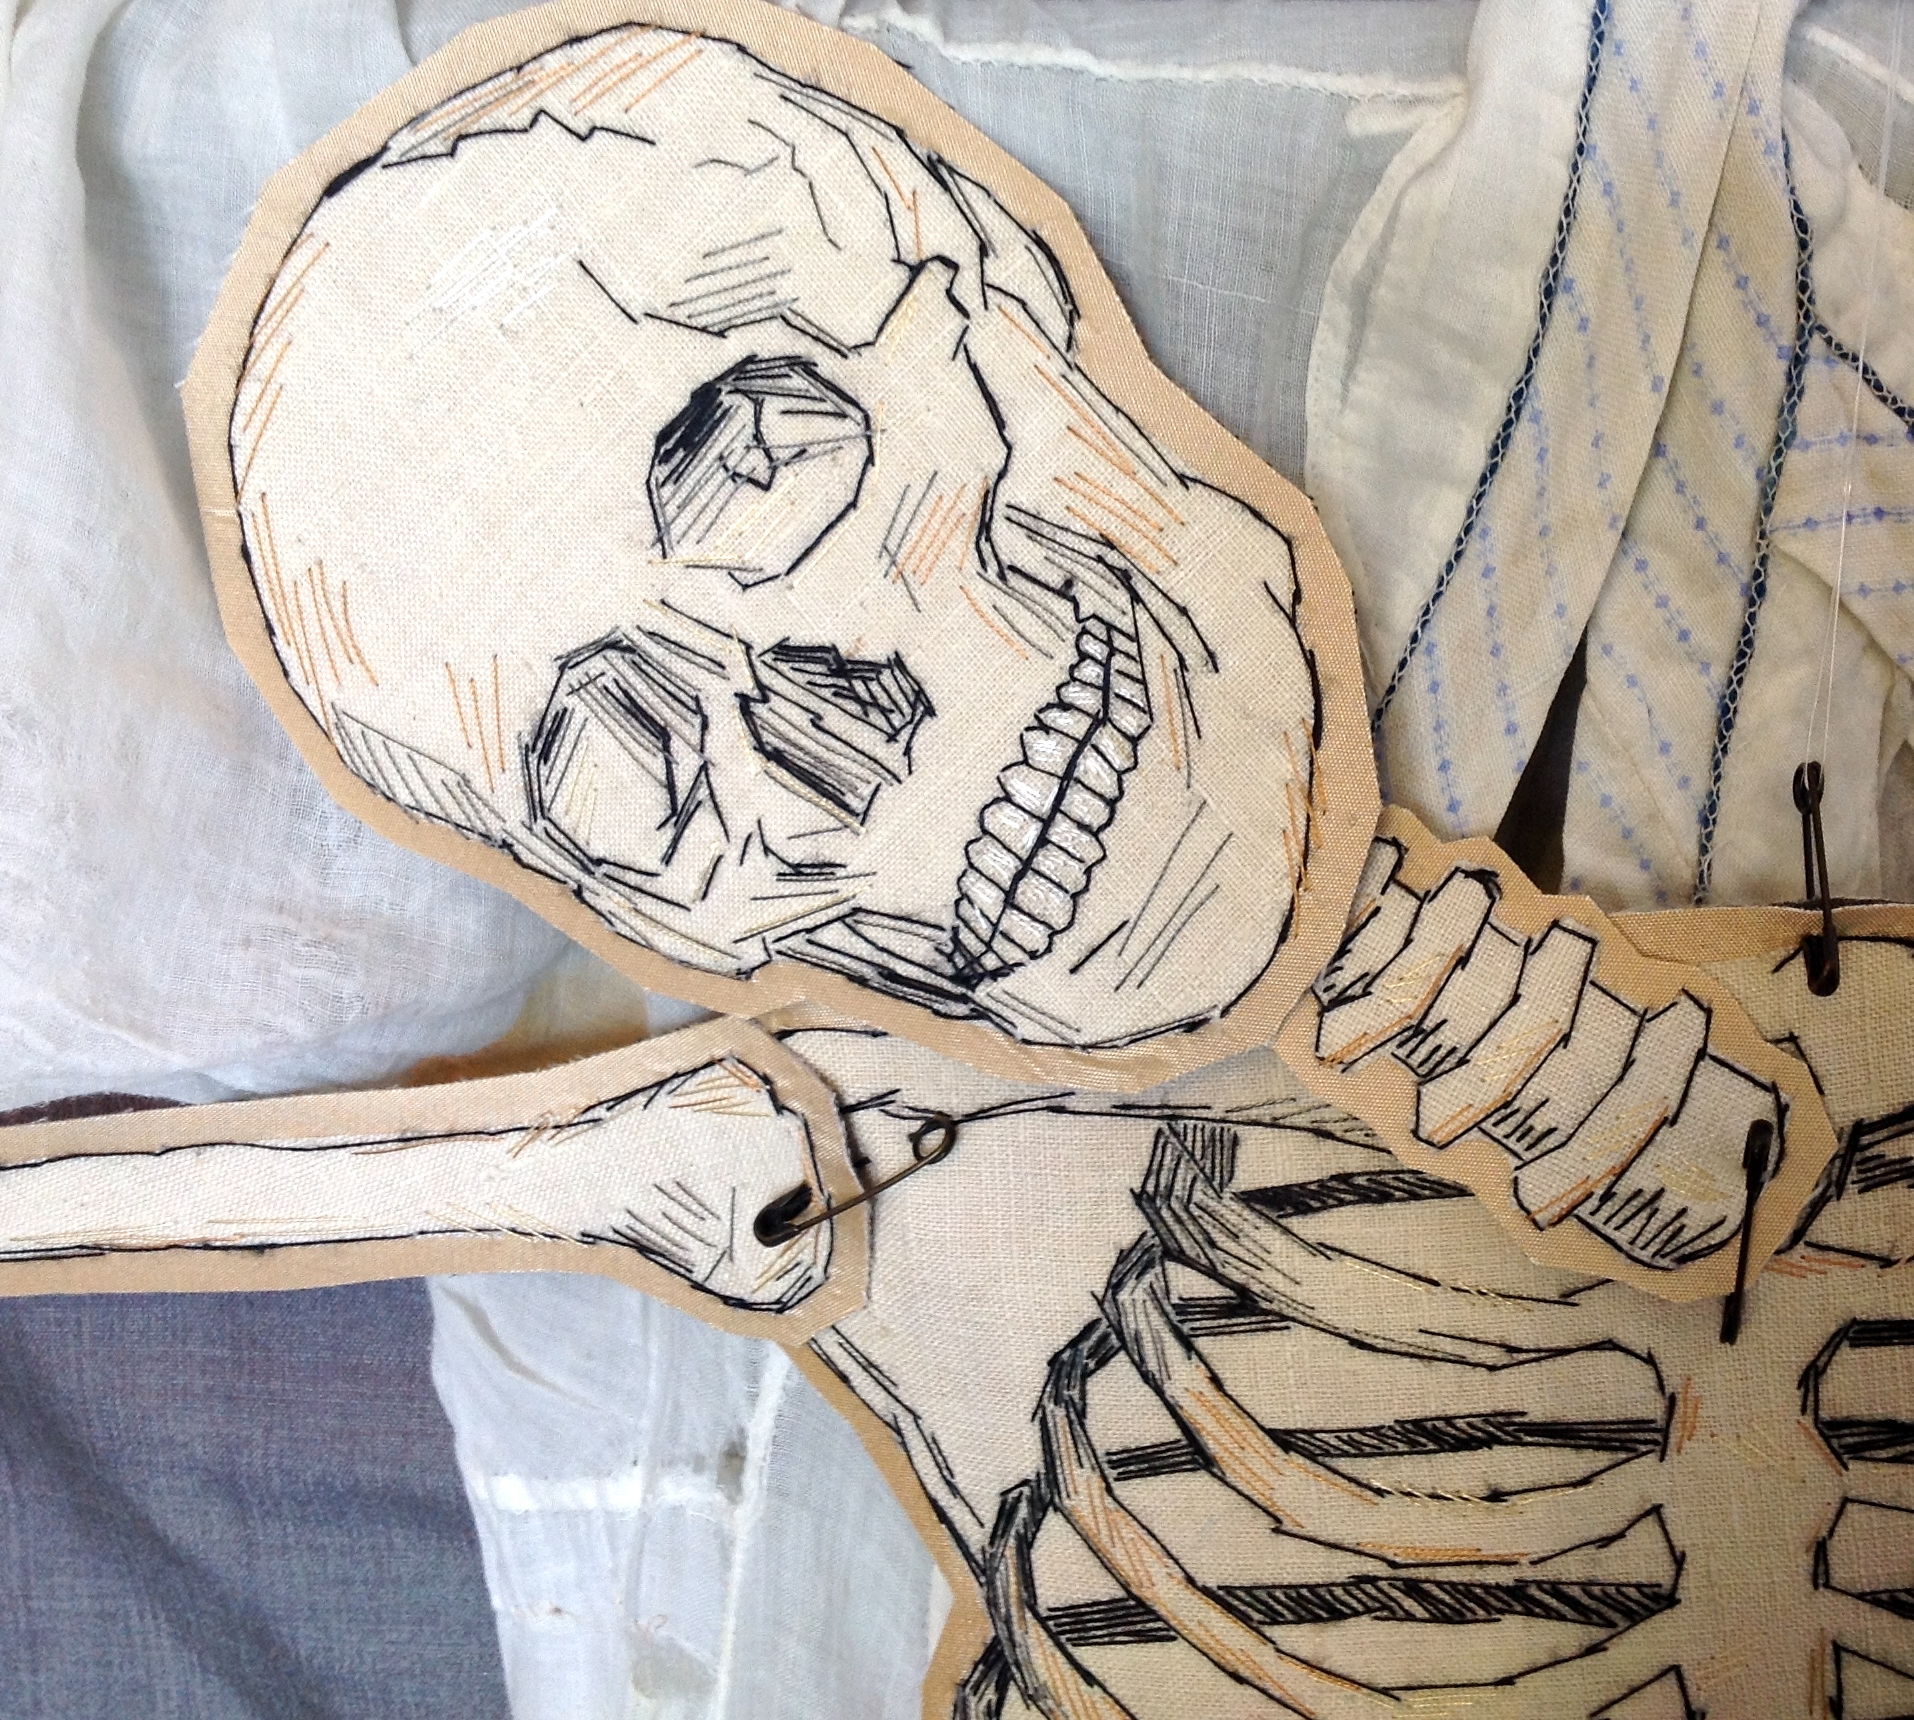 Skeleton_detail.jpg